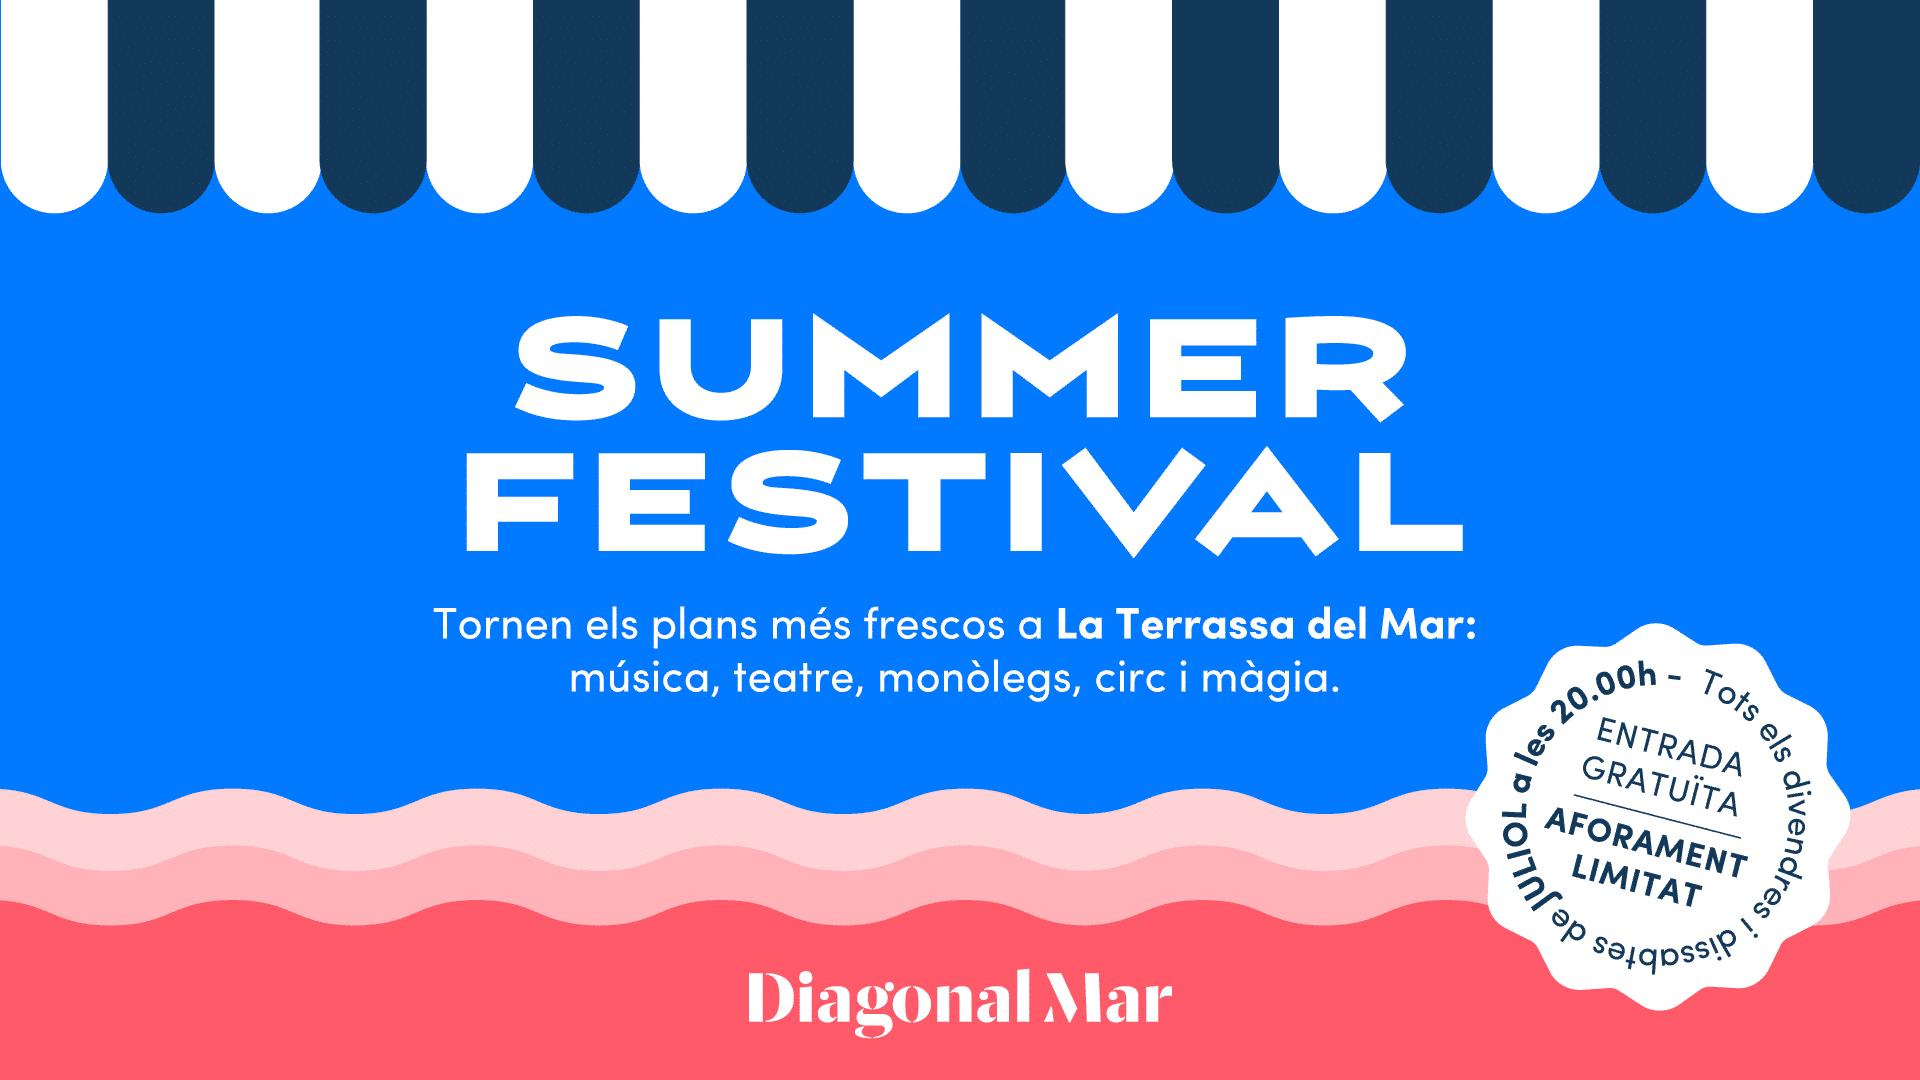 Summer Festival Diagonal cat